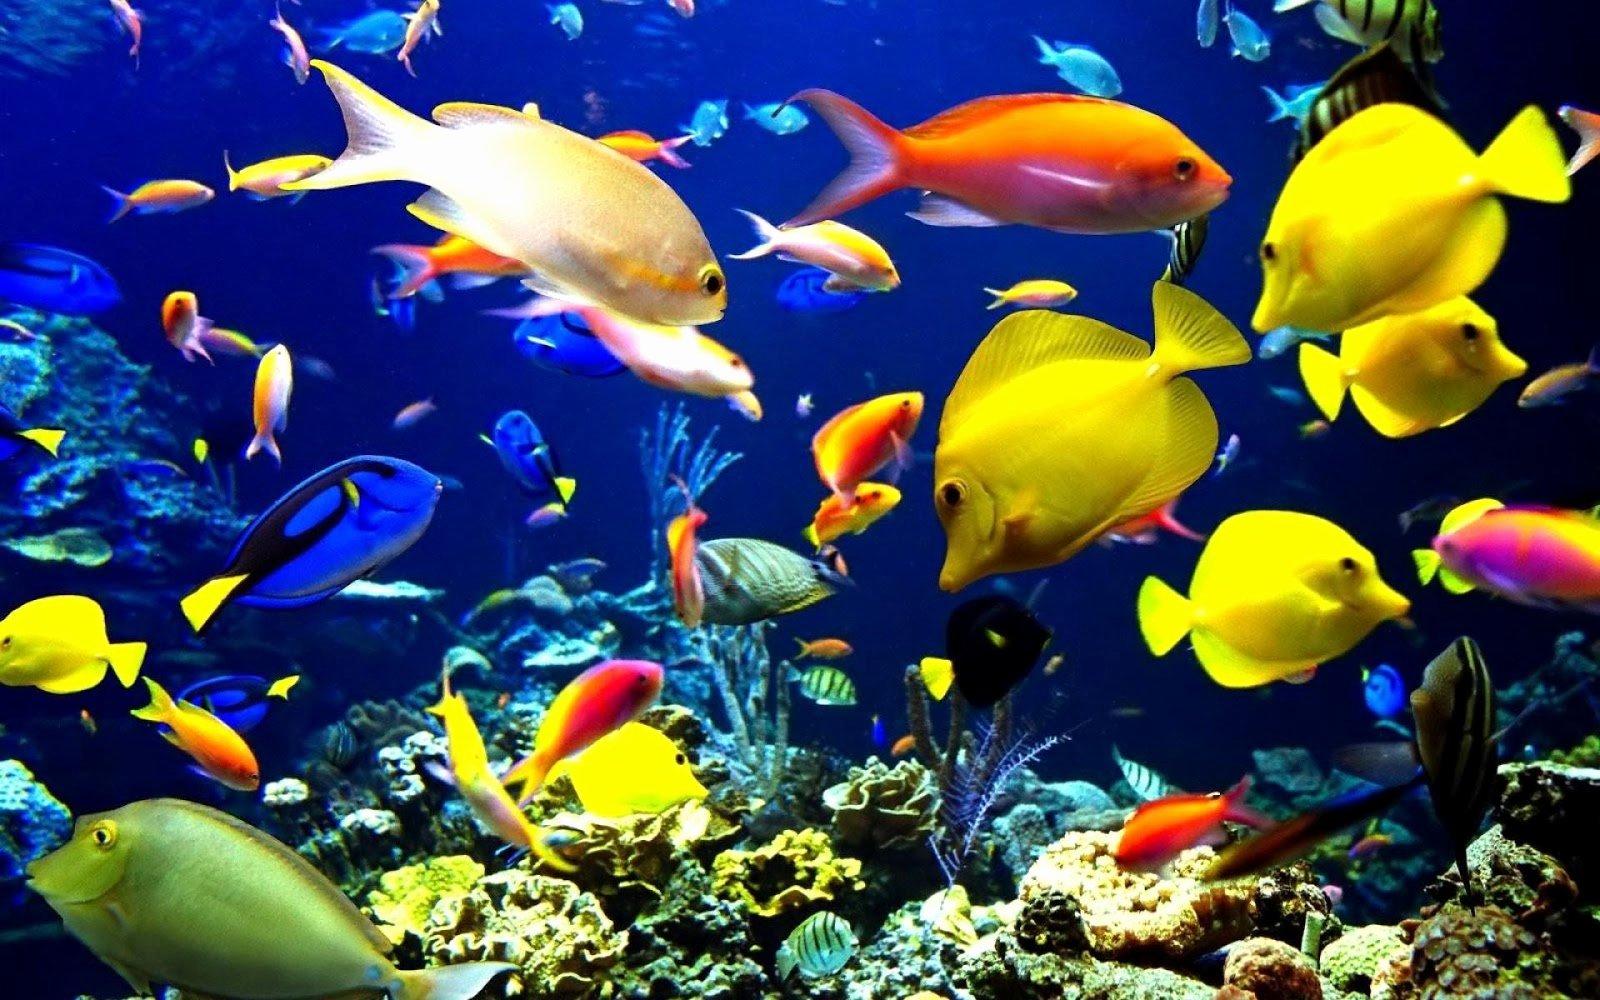 3d Fish Tank Wallpaper Luxury 20 Aquarium Hd Wallpapers and Freshwater Aquarium